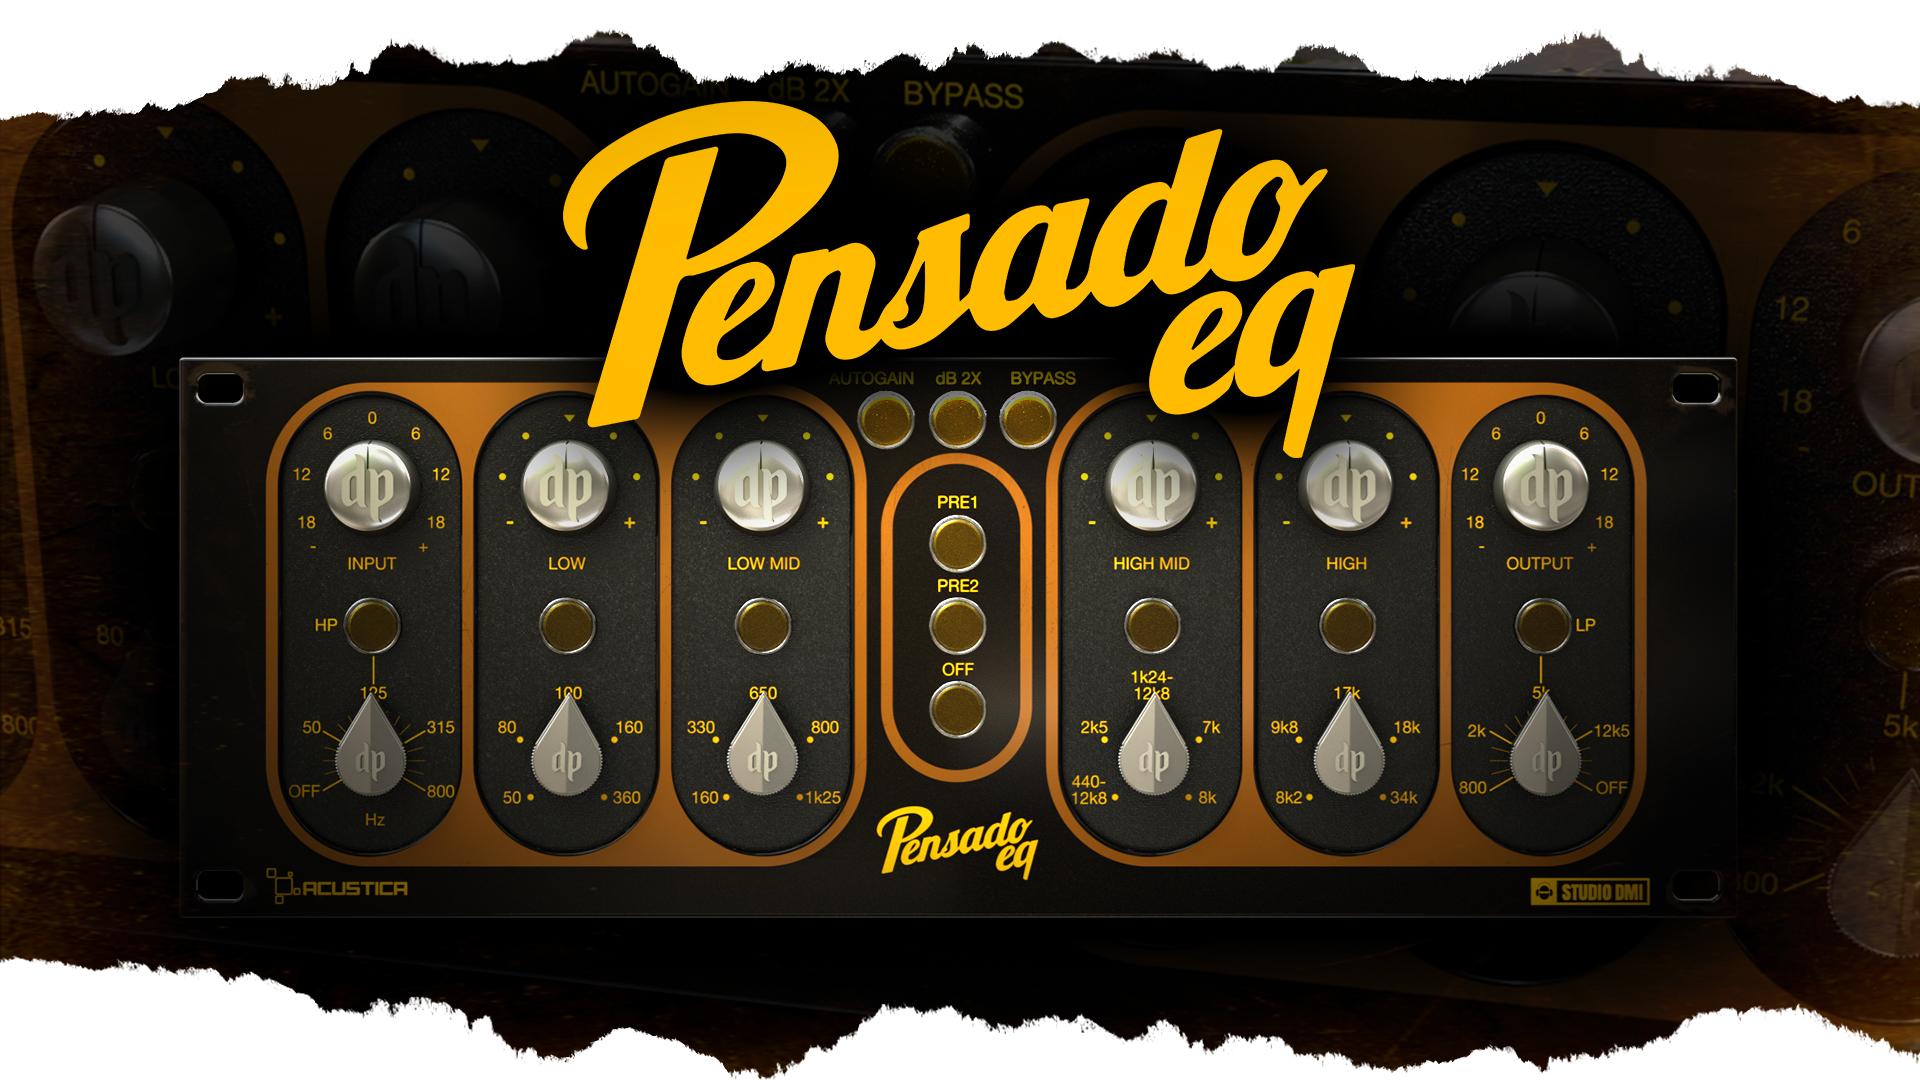 Introducing Pensado EQ